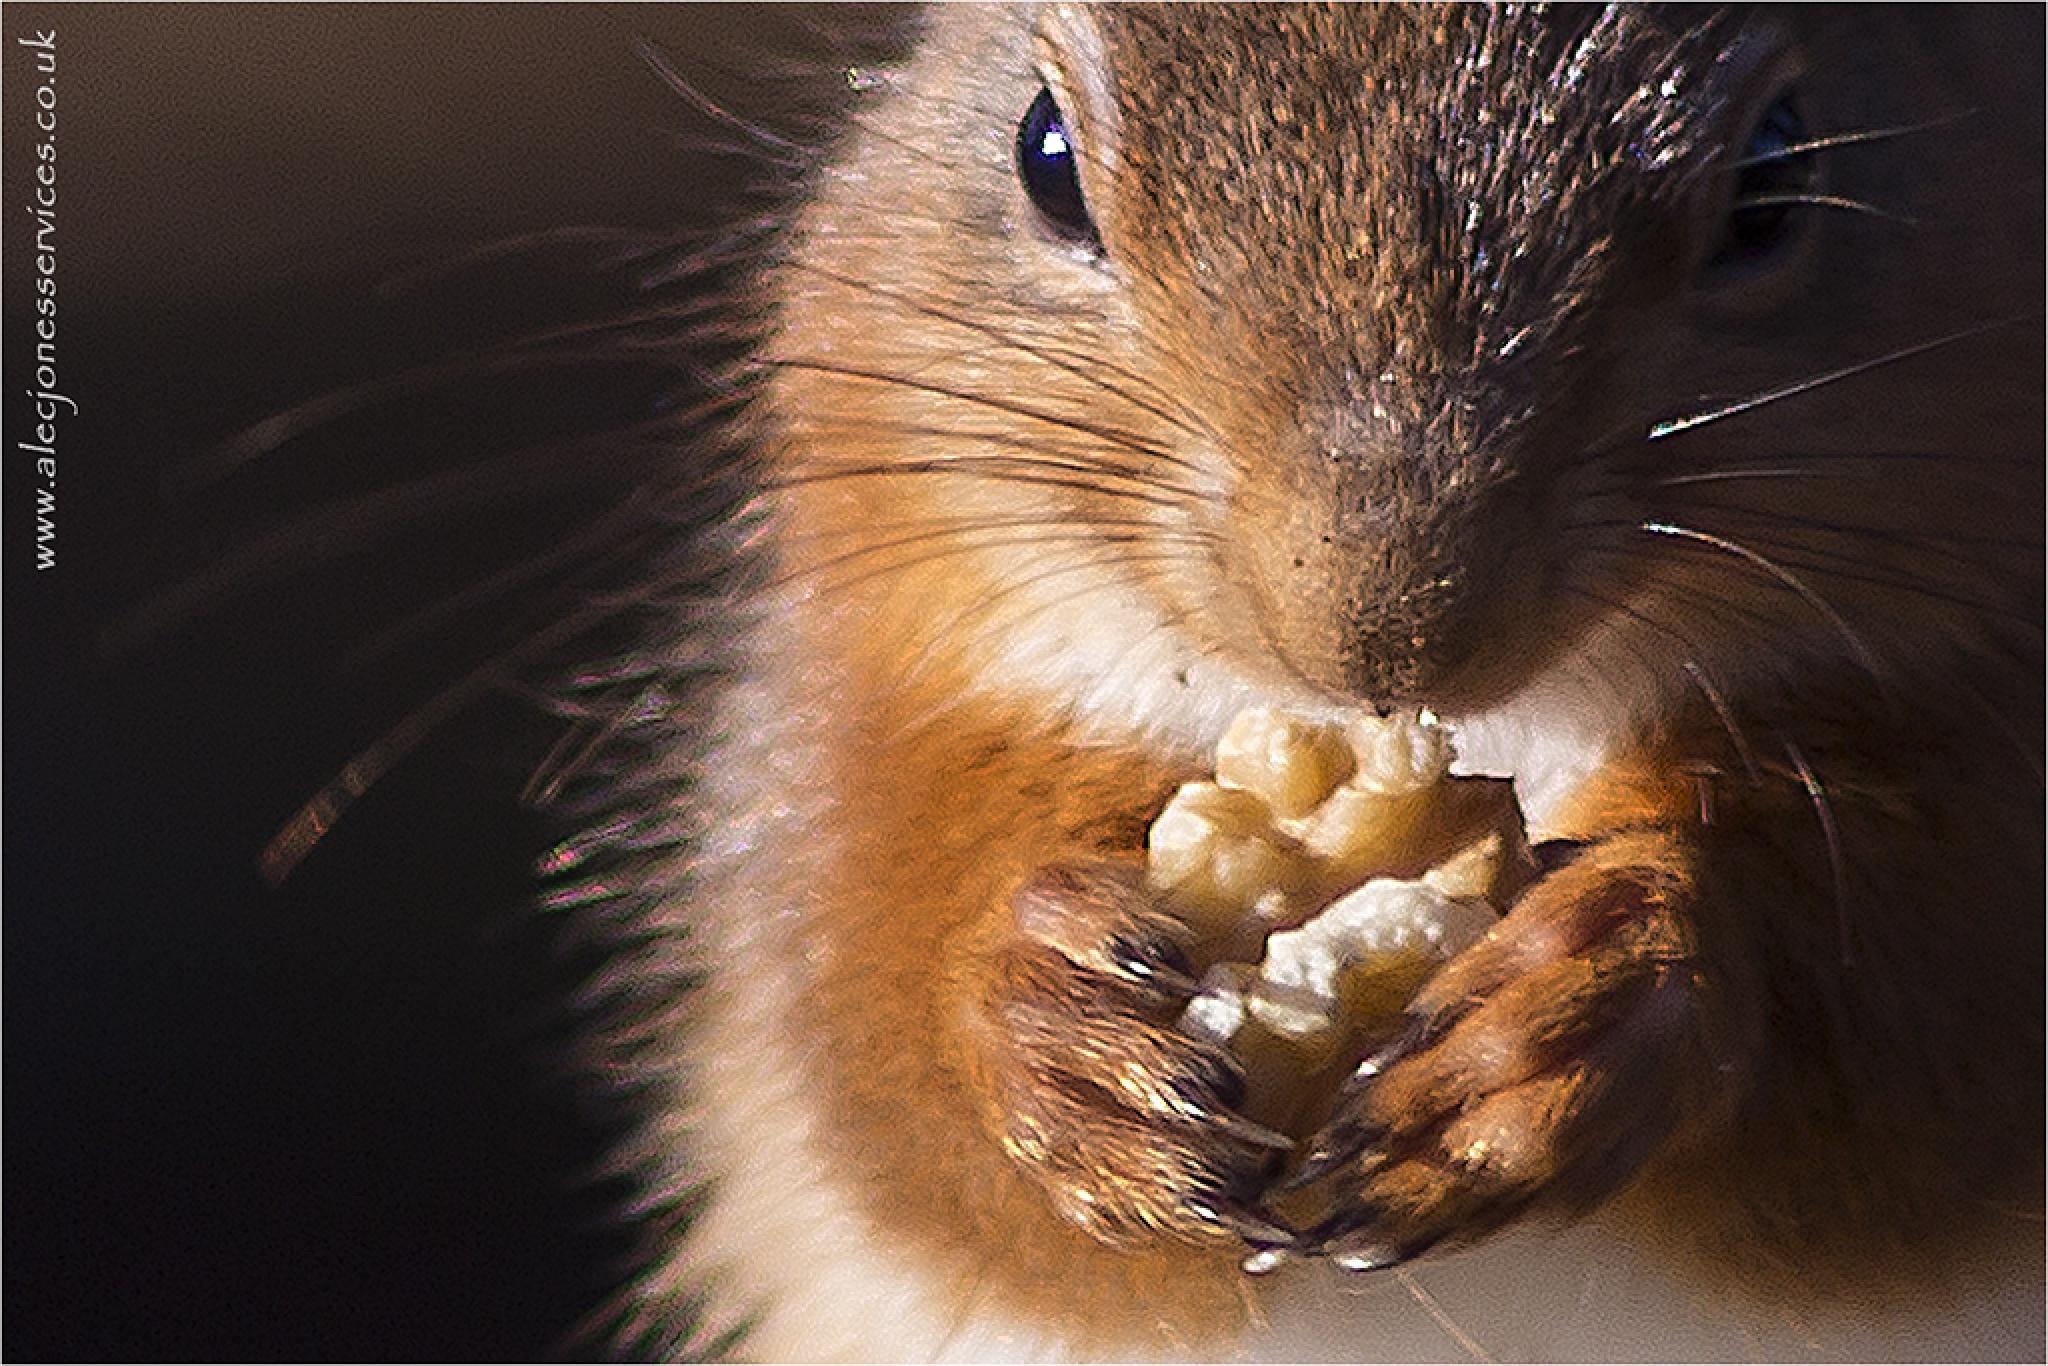 Just add nuts by AlecJones